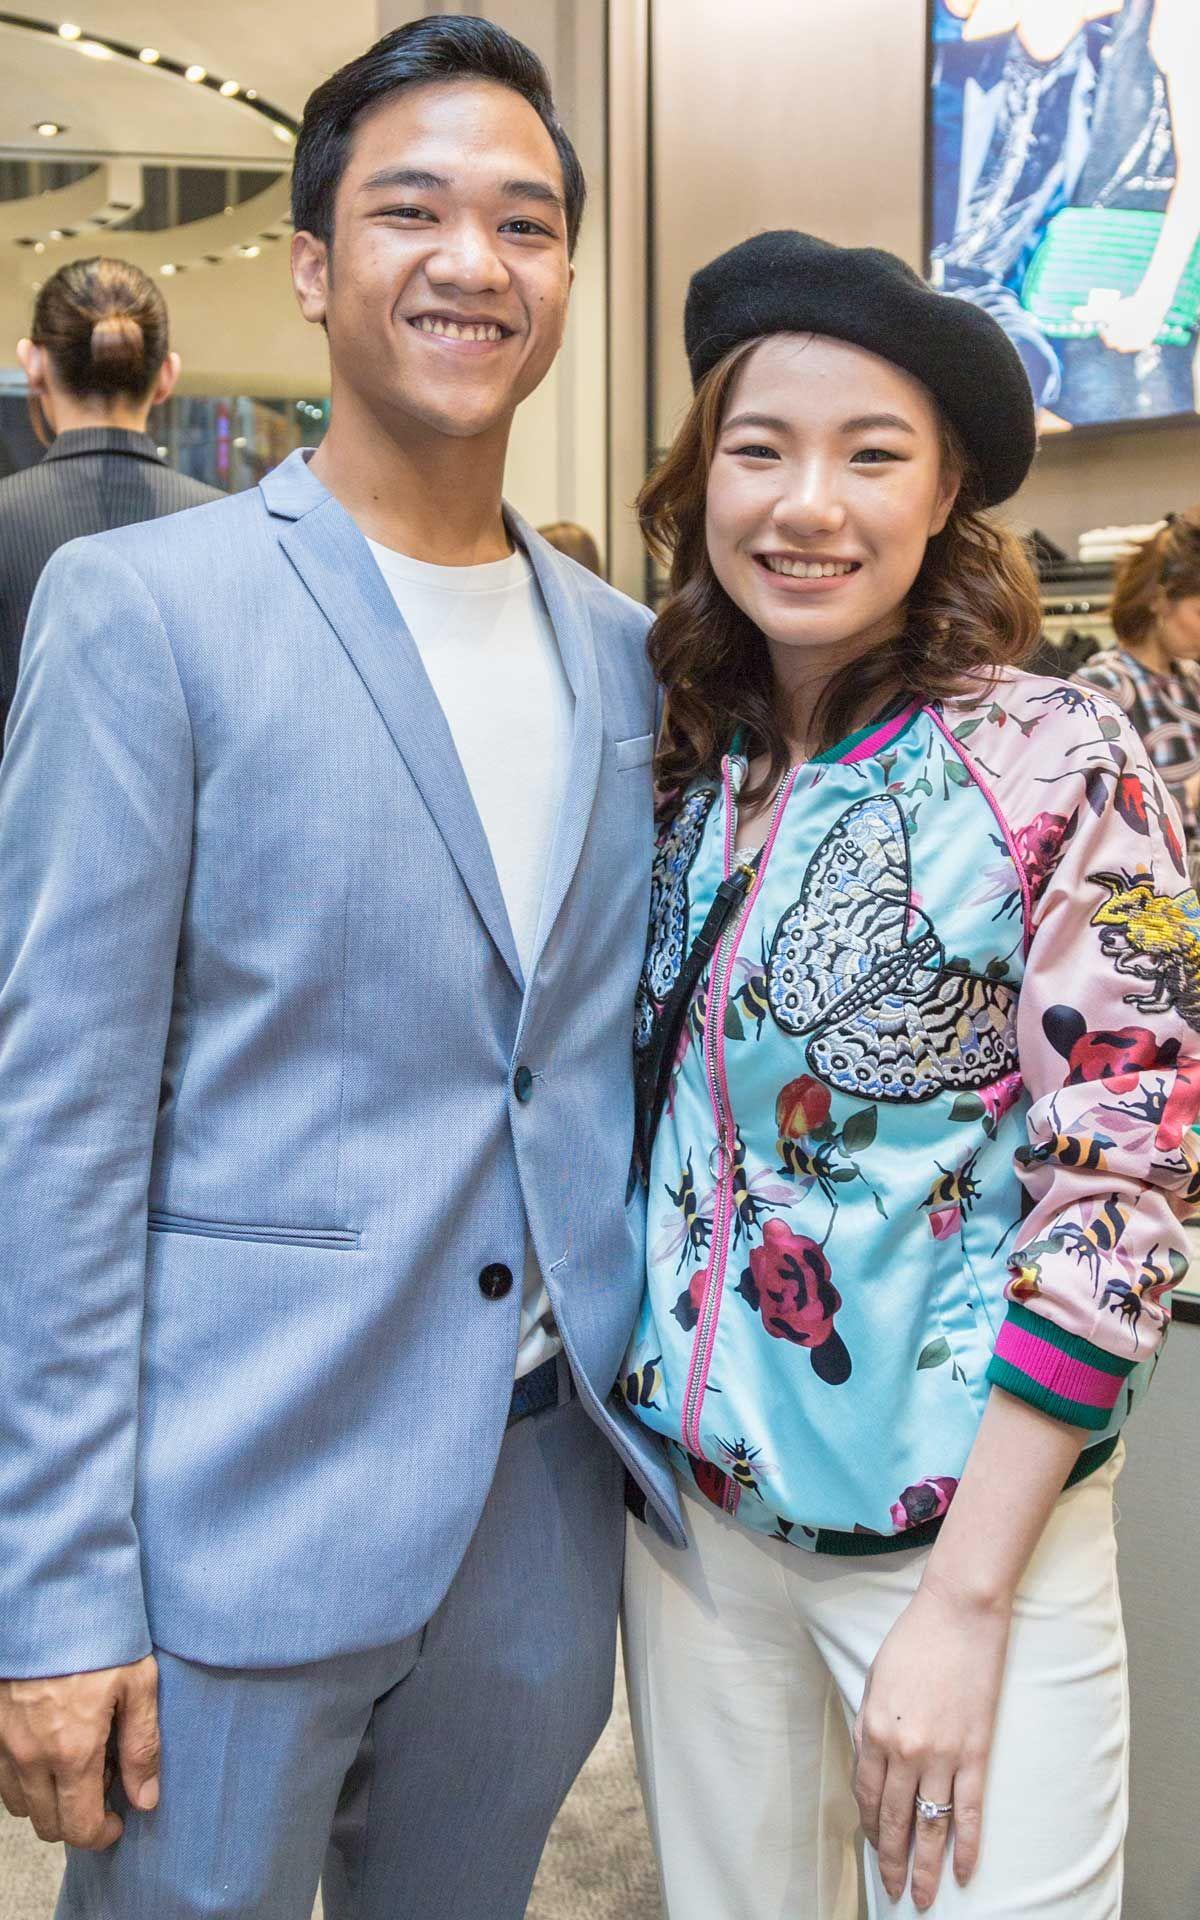 Rizrin Shah and Pearl Tan